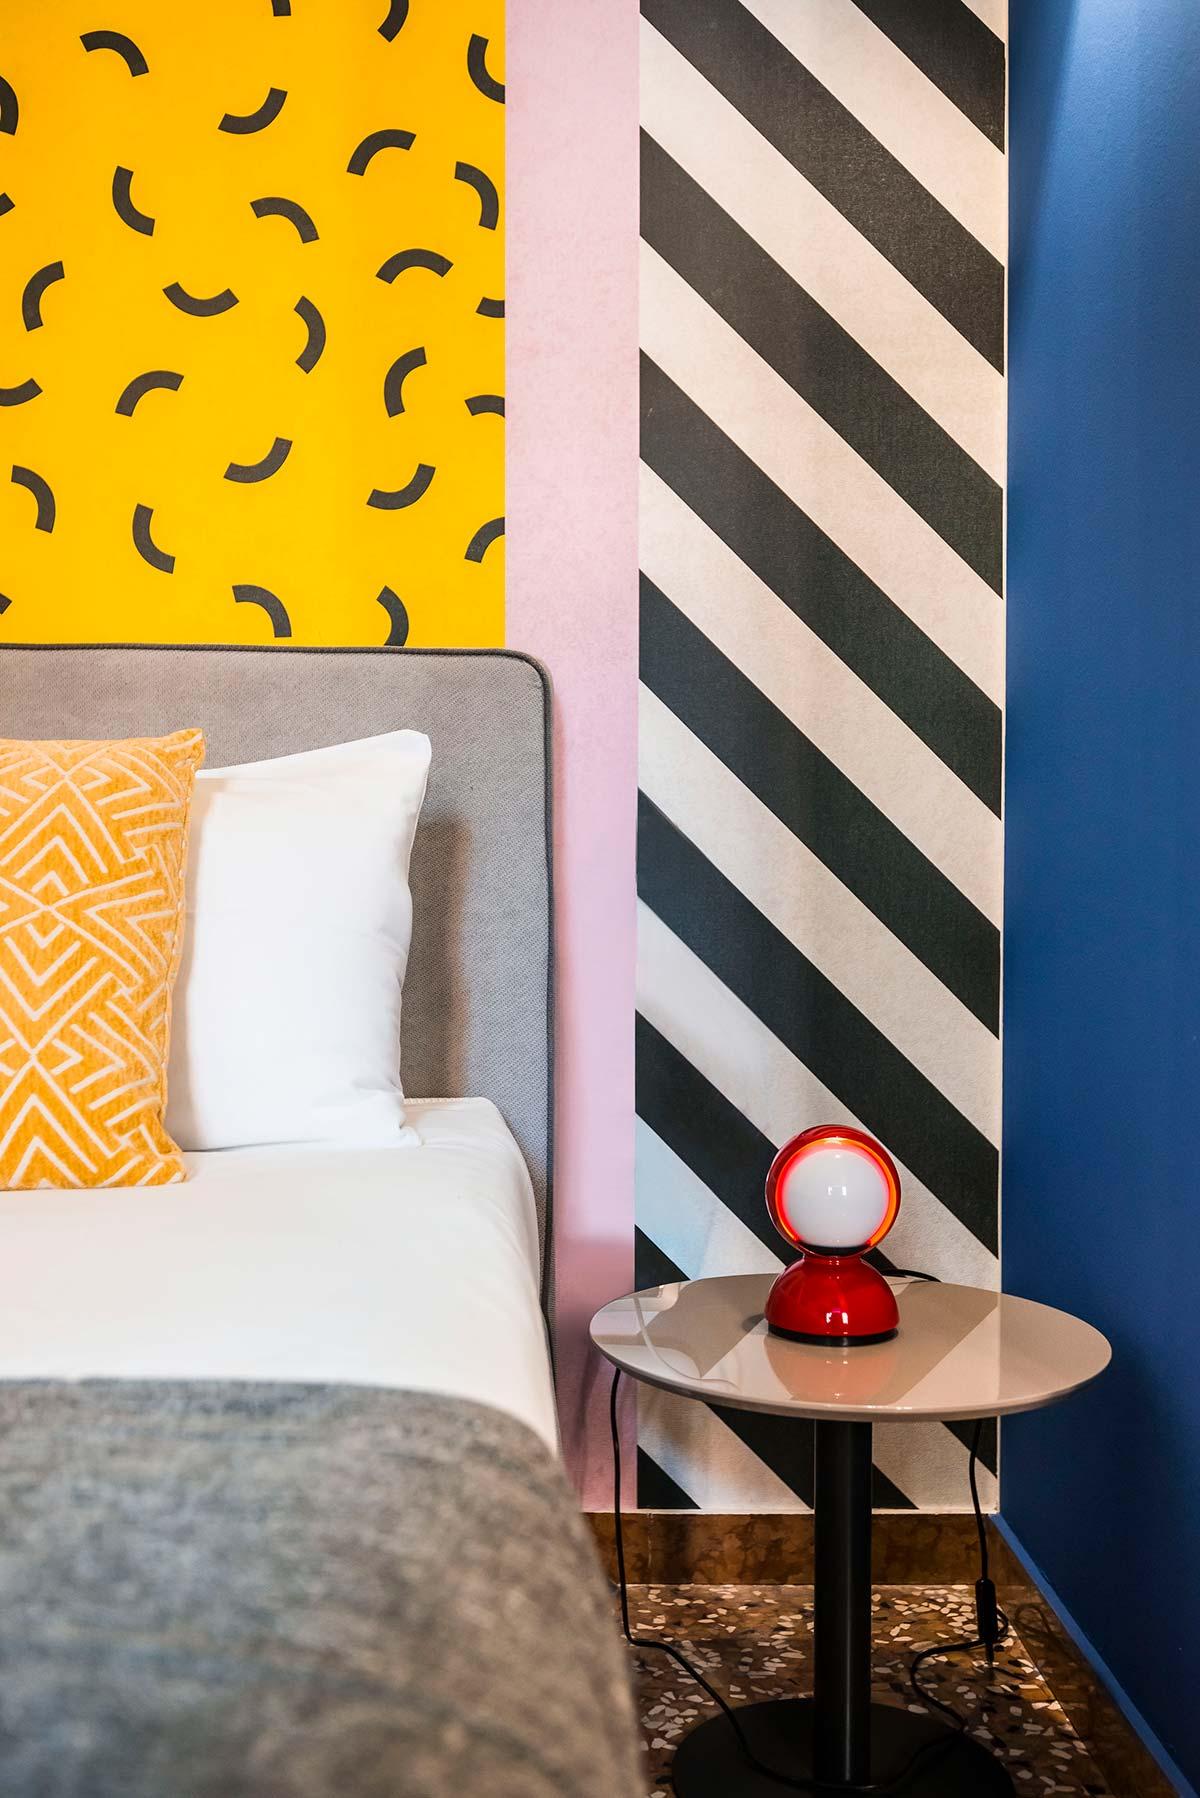 Eighties&Bolidism, Design Club Branded Apartments, Bologna